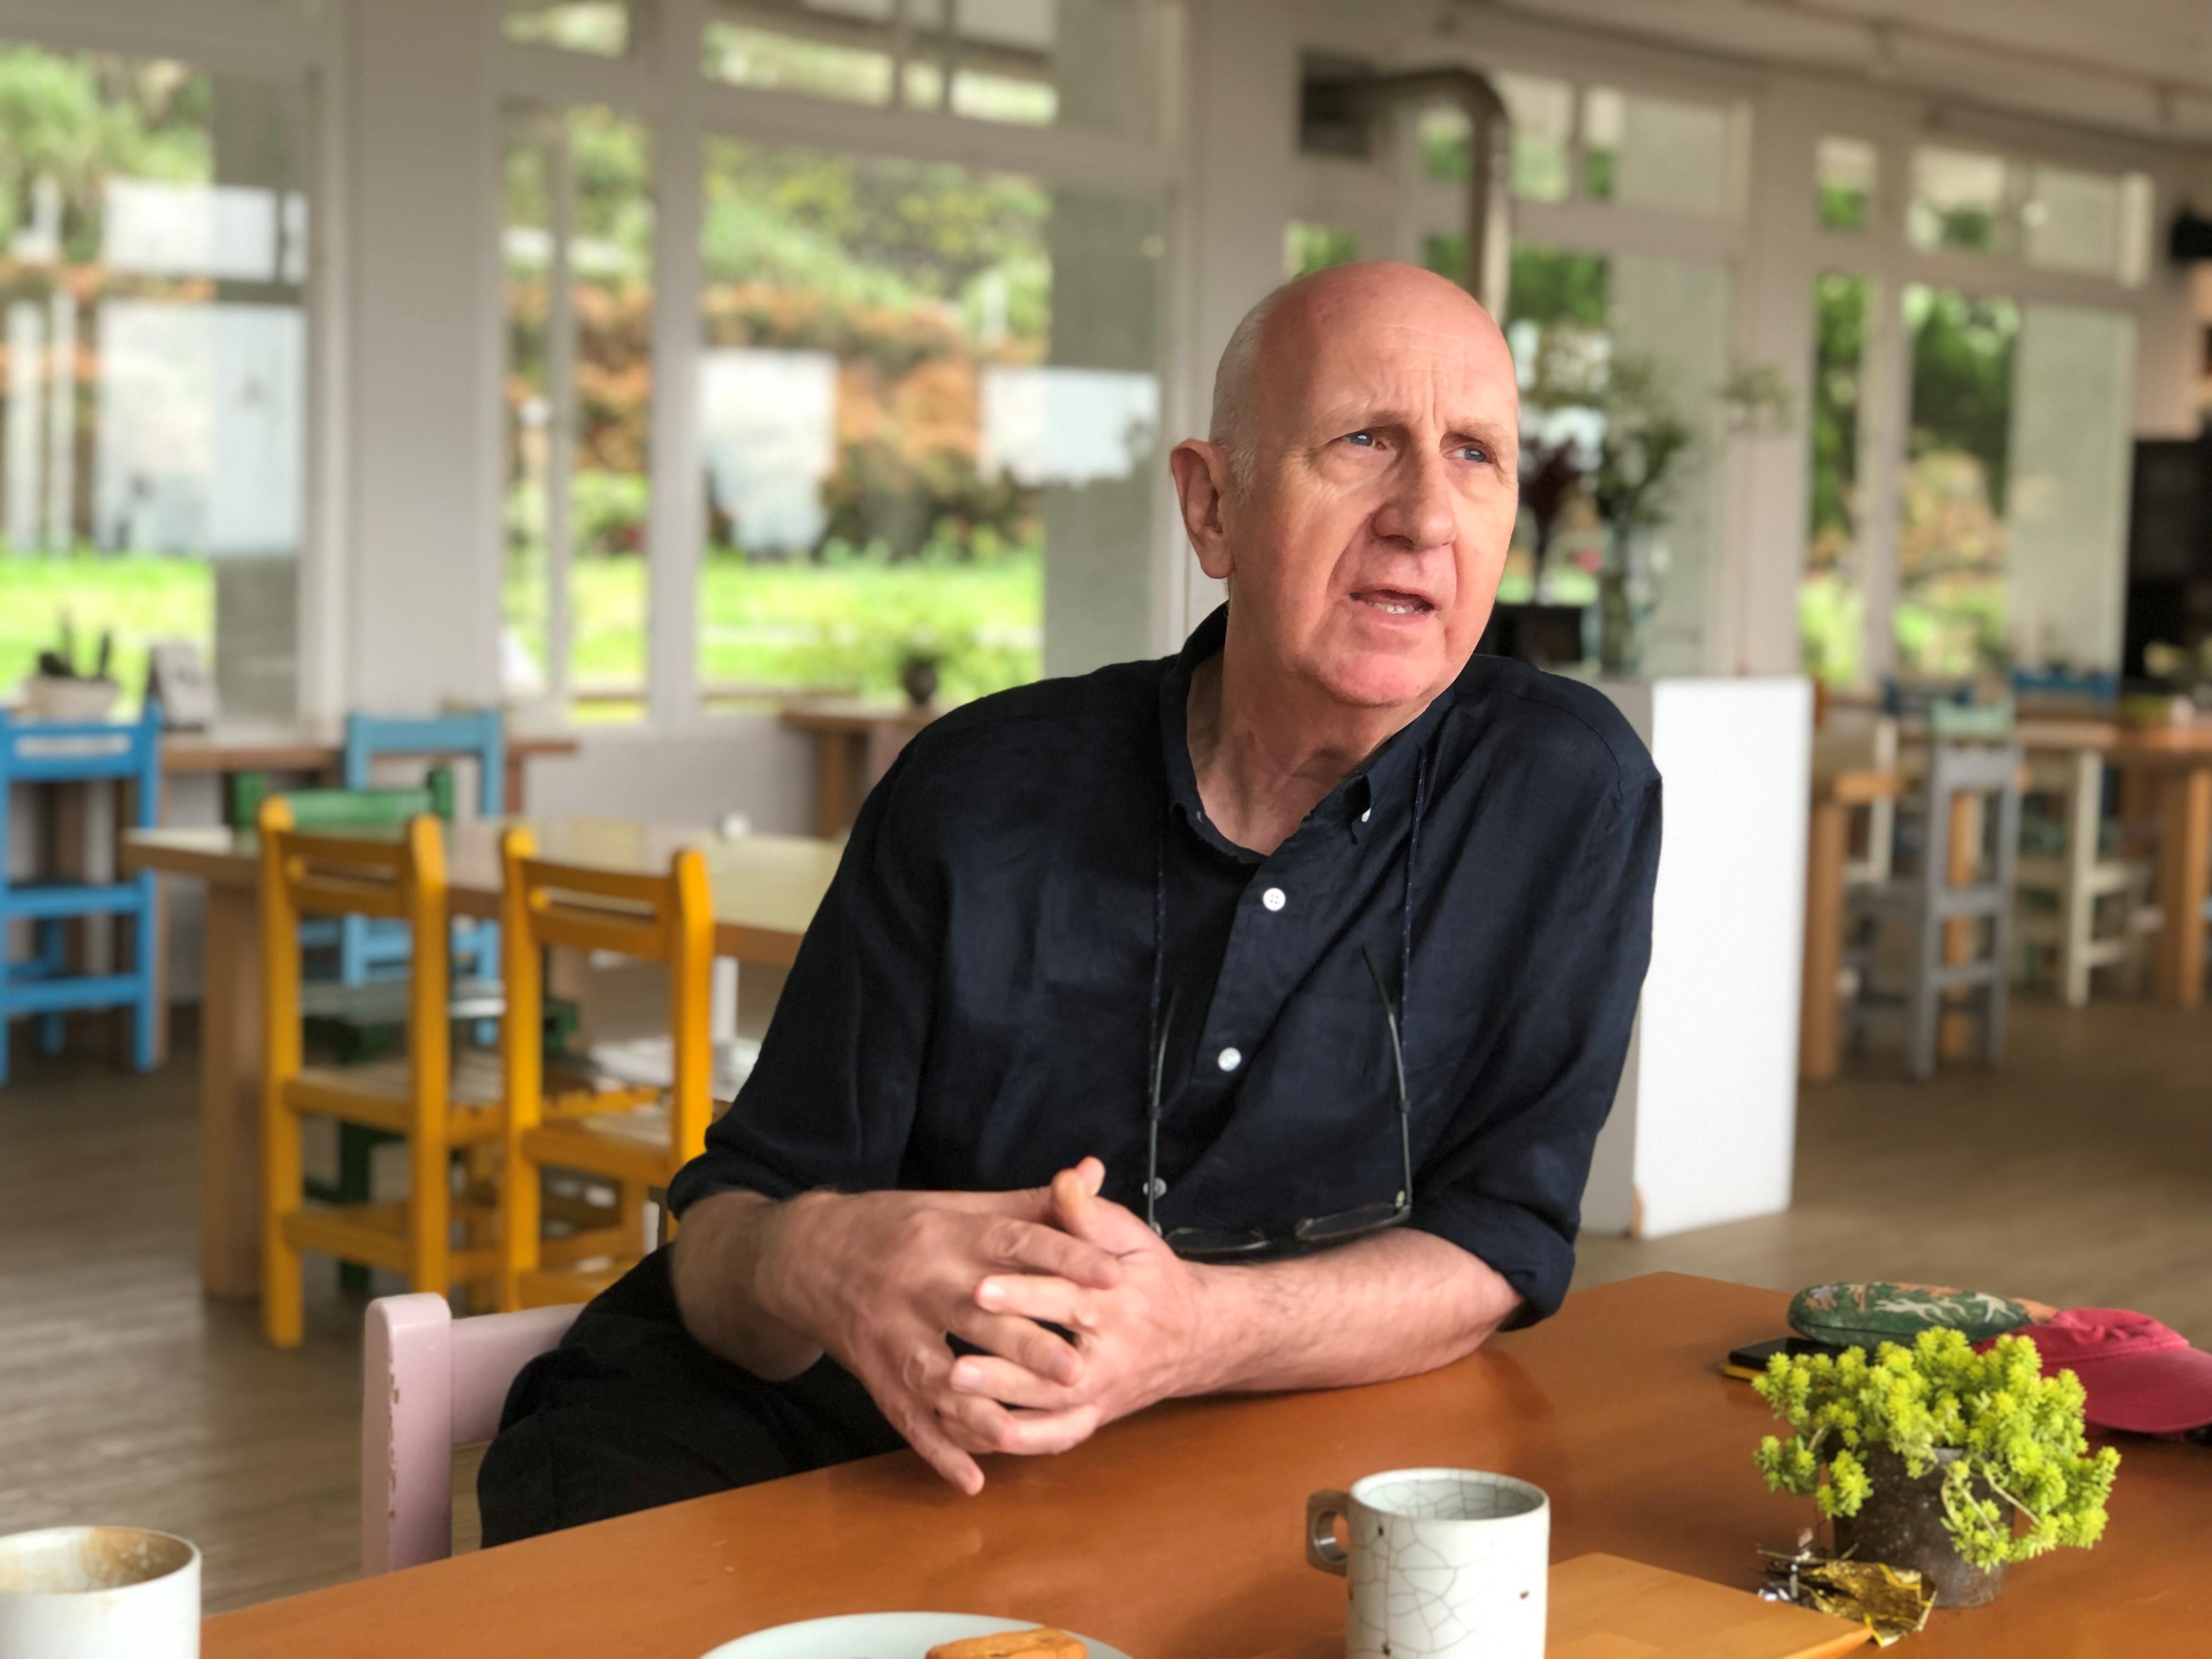 專訪柯律格 (Craig Clunas, 1954-) 教授